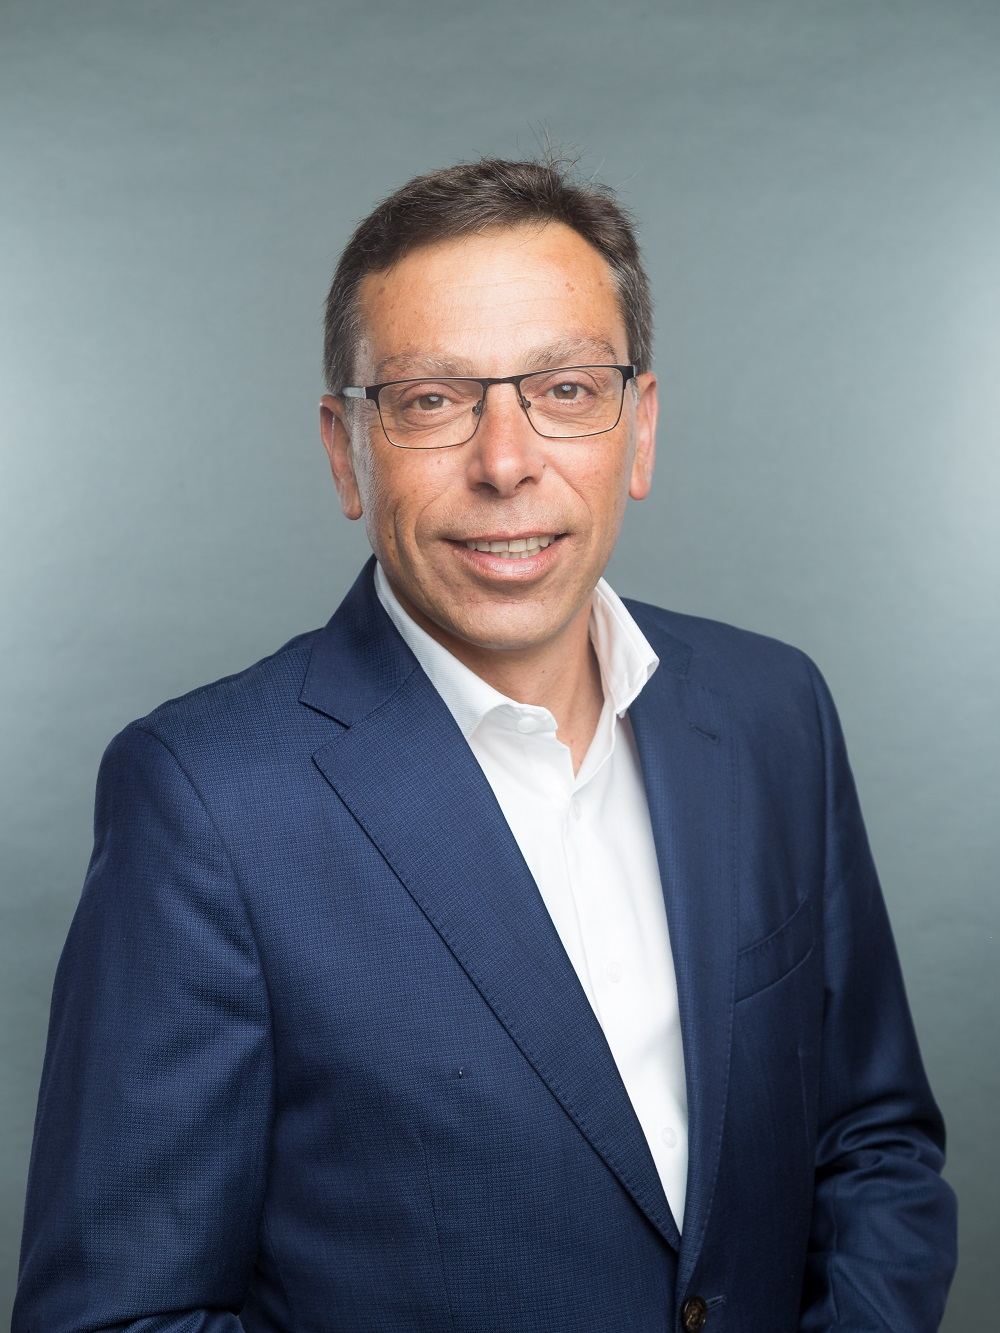 Francisco Manuel Atta Pérez